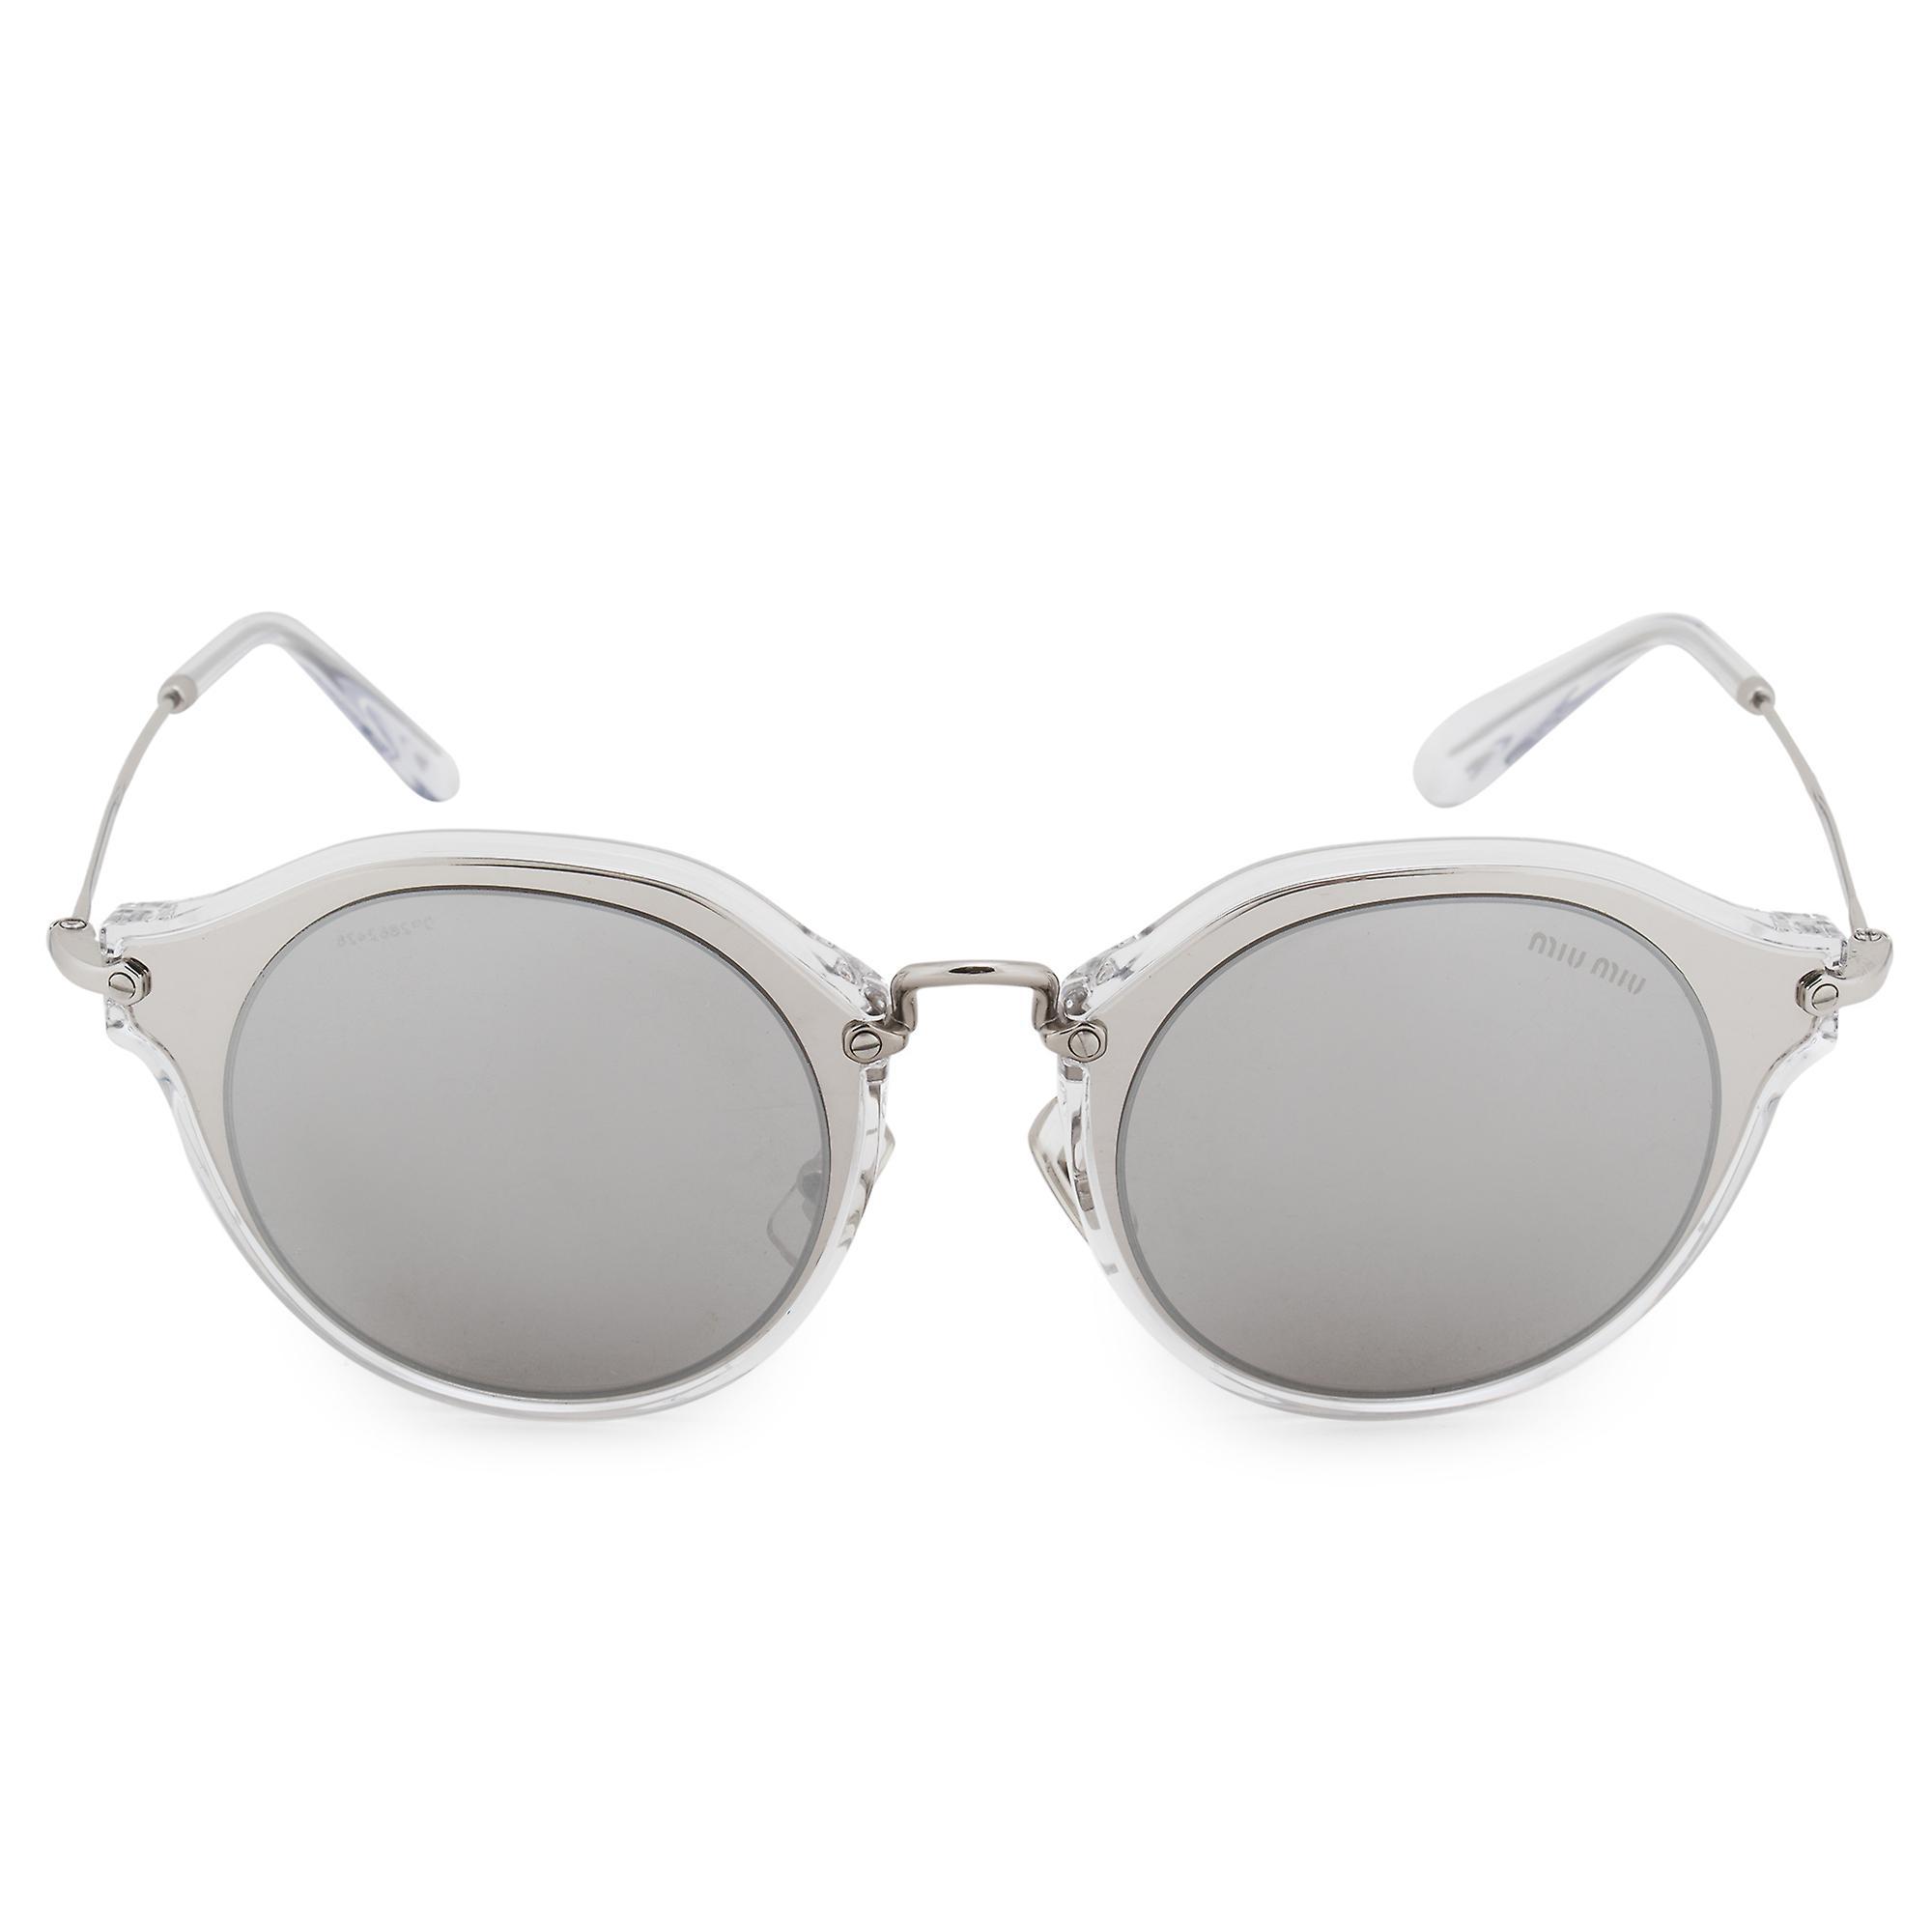 Miu Miu Round Sunglasses SMU51SS 1BC2B0 49